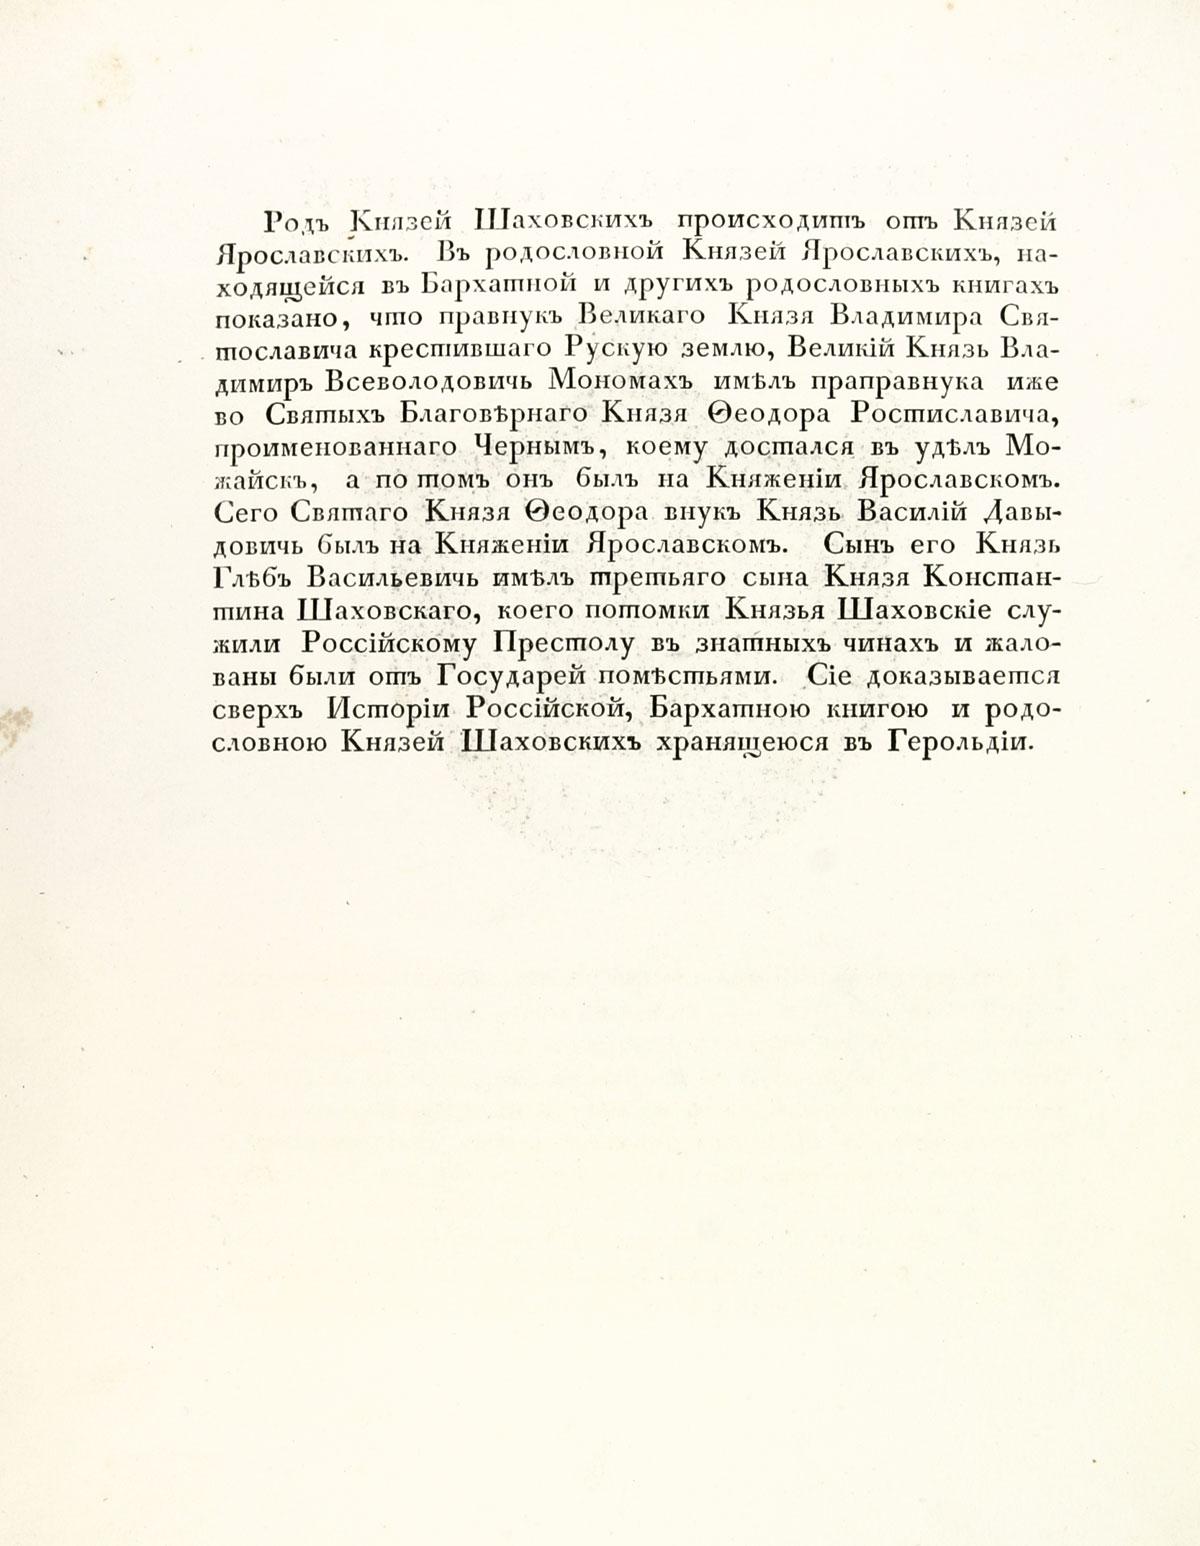 Герб рода князей Шаховских, стр. 2